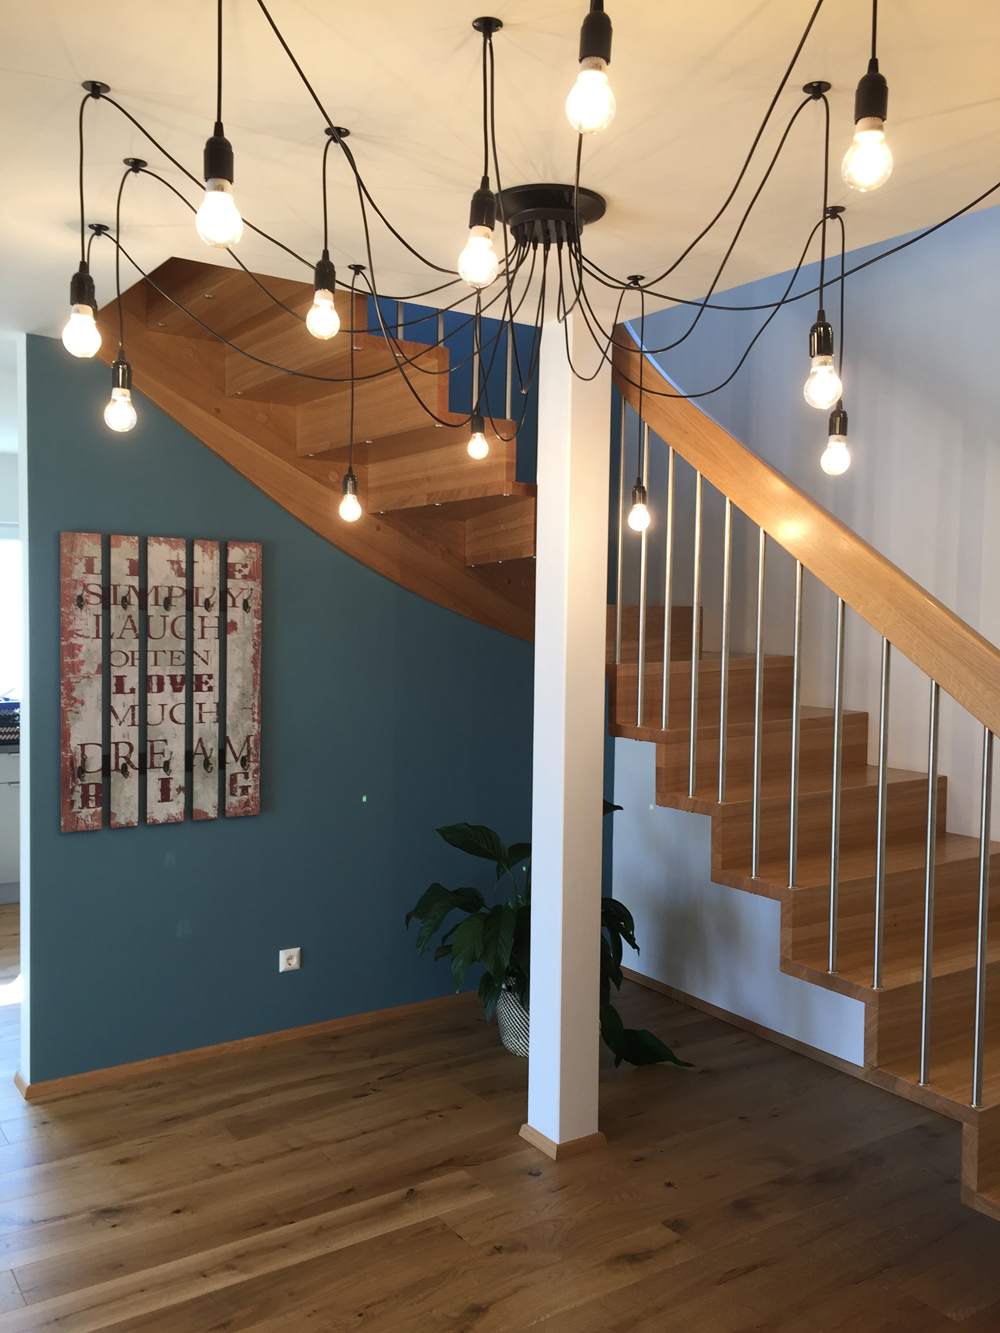 Zimmer k che kabinett raumgestaltung interior design for Raumgestaltung unikat